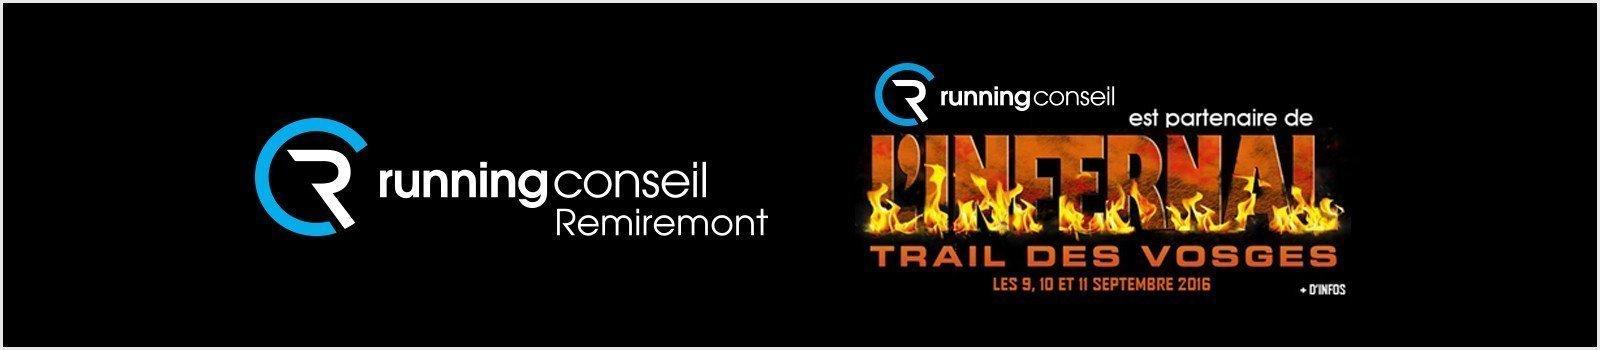 L'INFERNAL Trail des Vosges - Partenaire Running Conseil